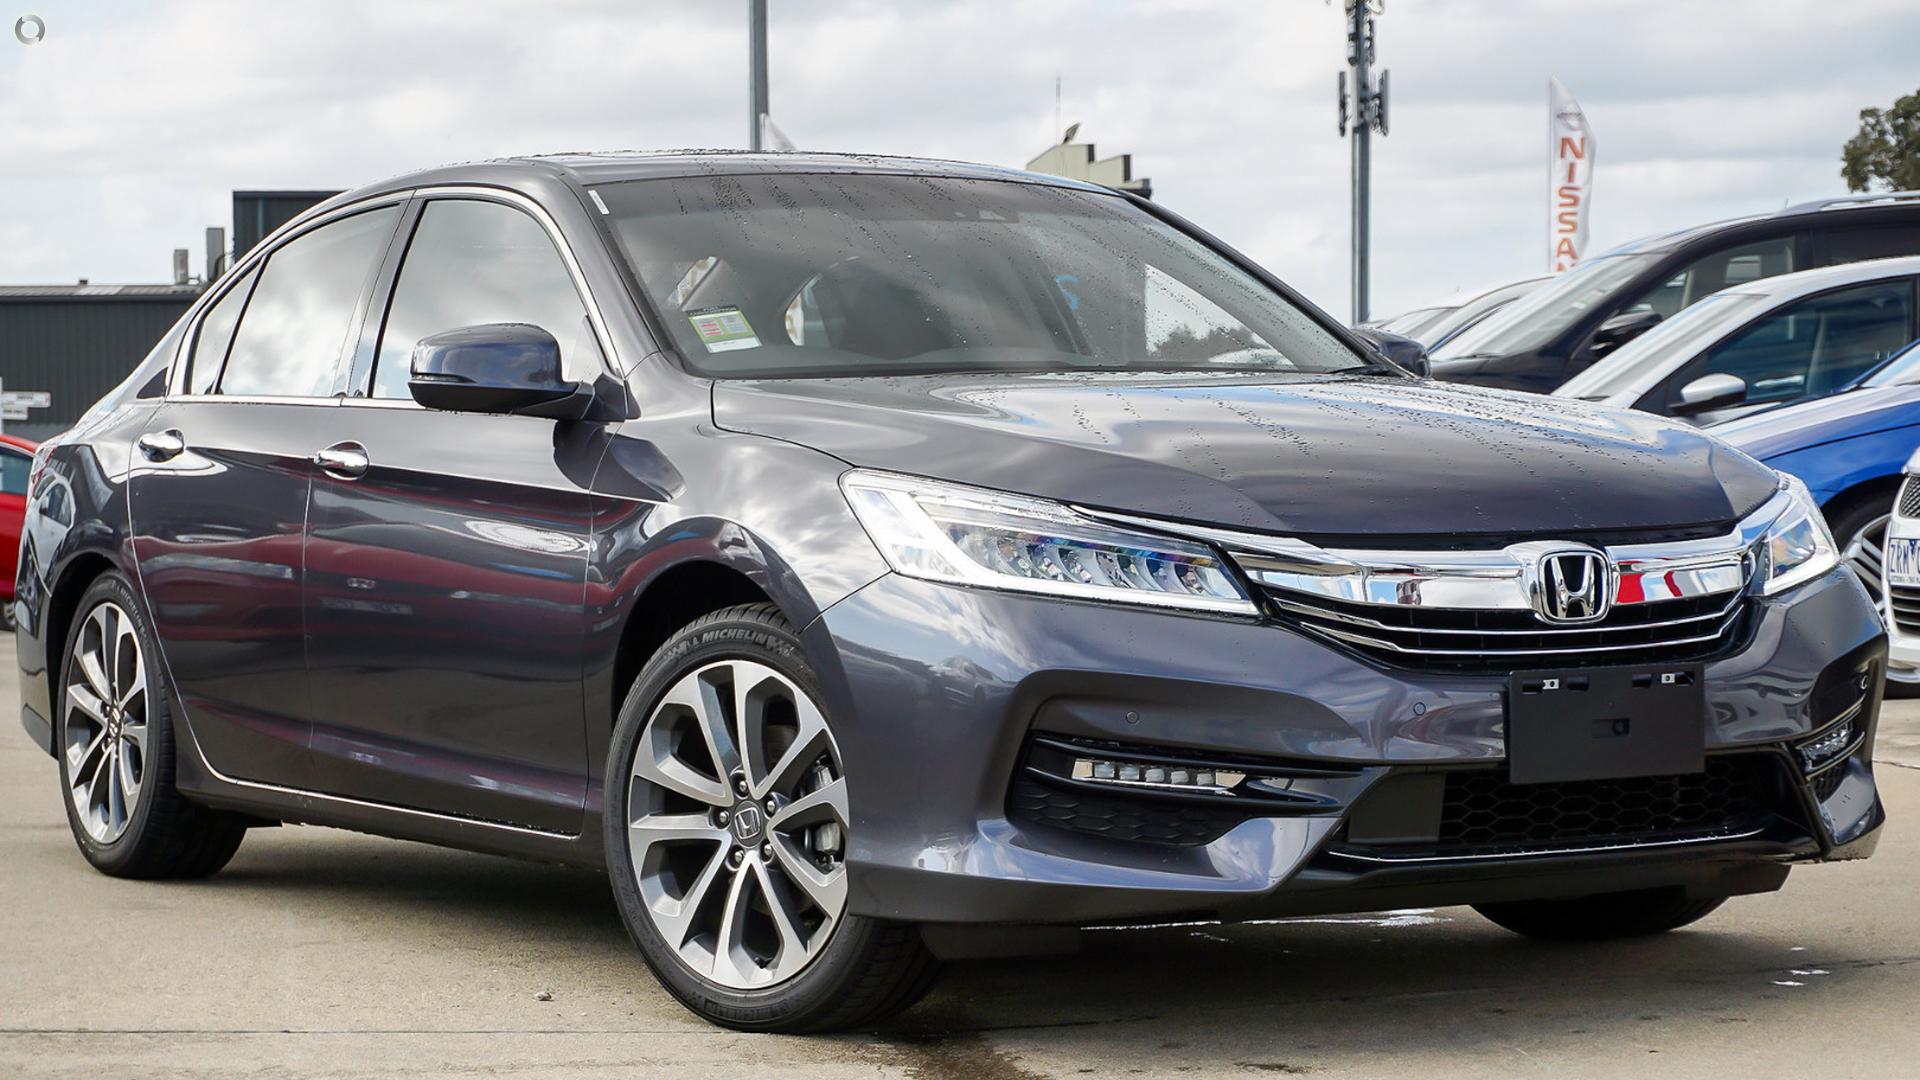 2017 Honda Accord 9th Gen